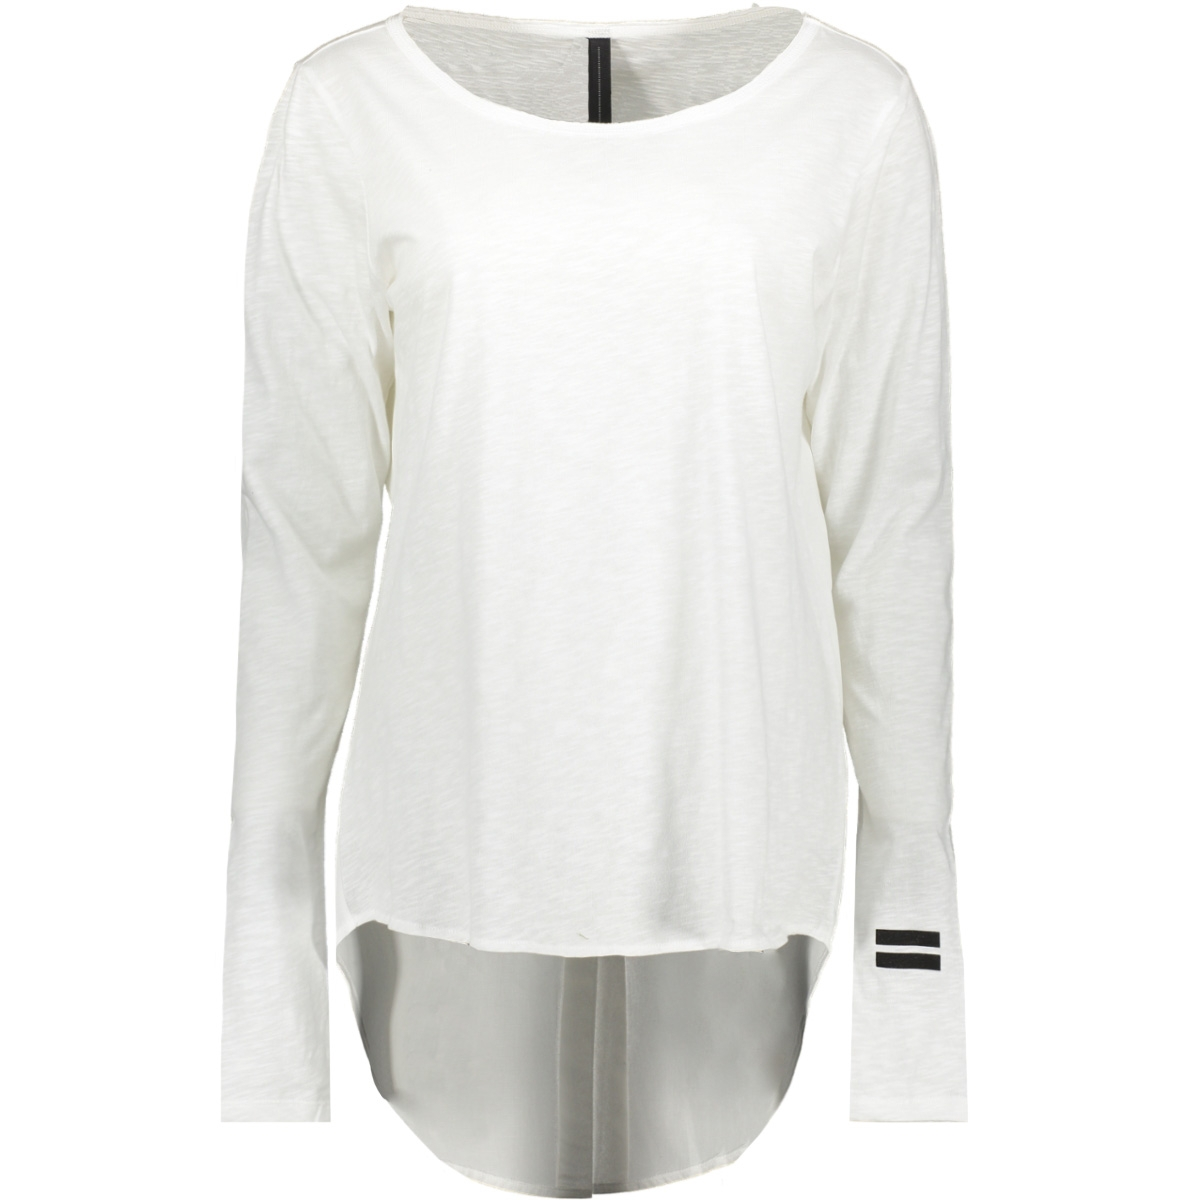 smoking tee 20 775 9900 10 days t-shirt white